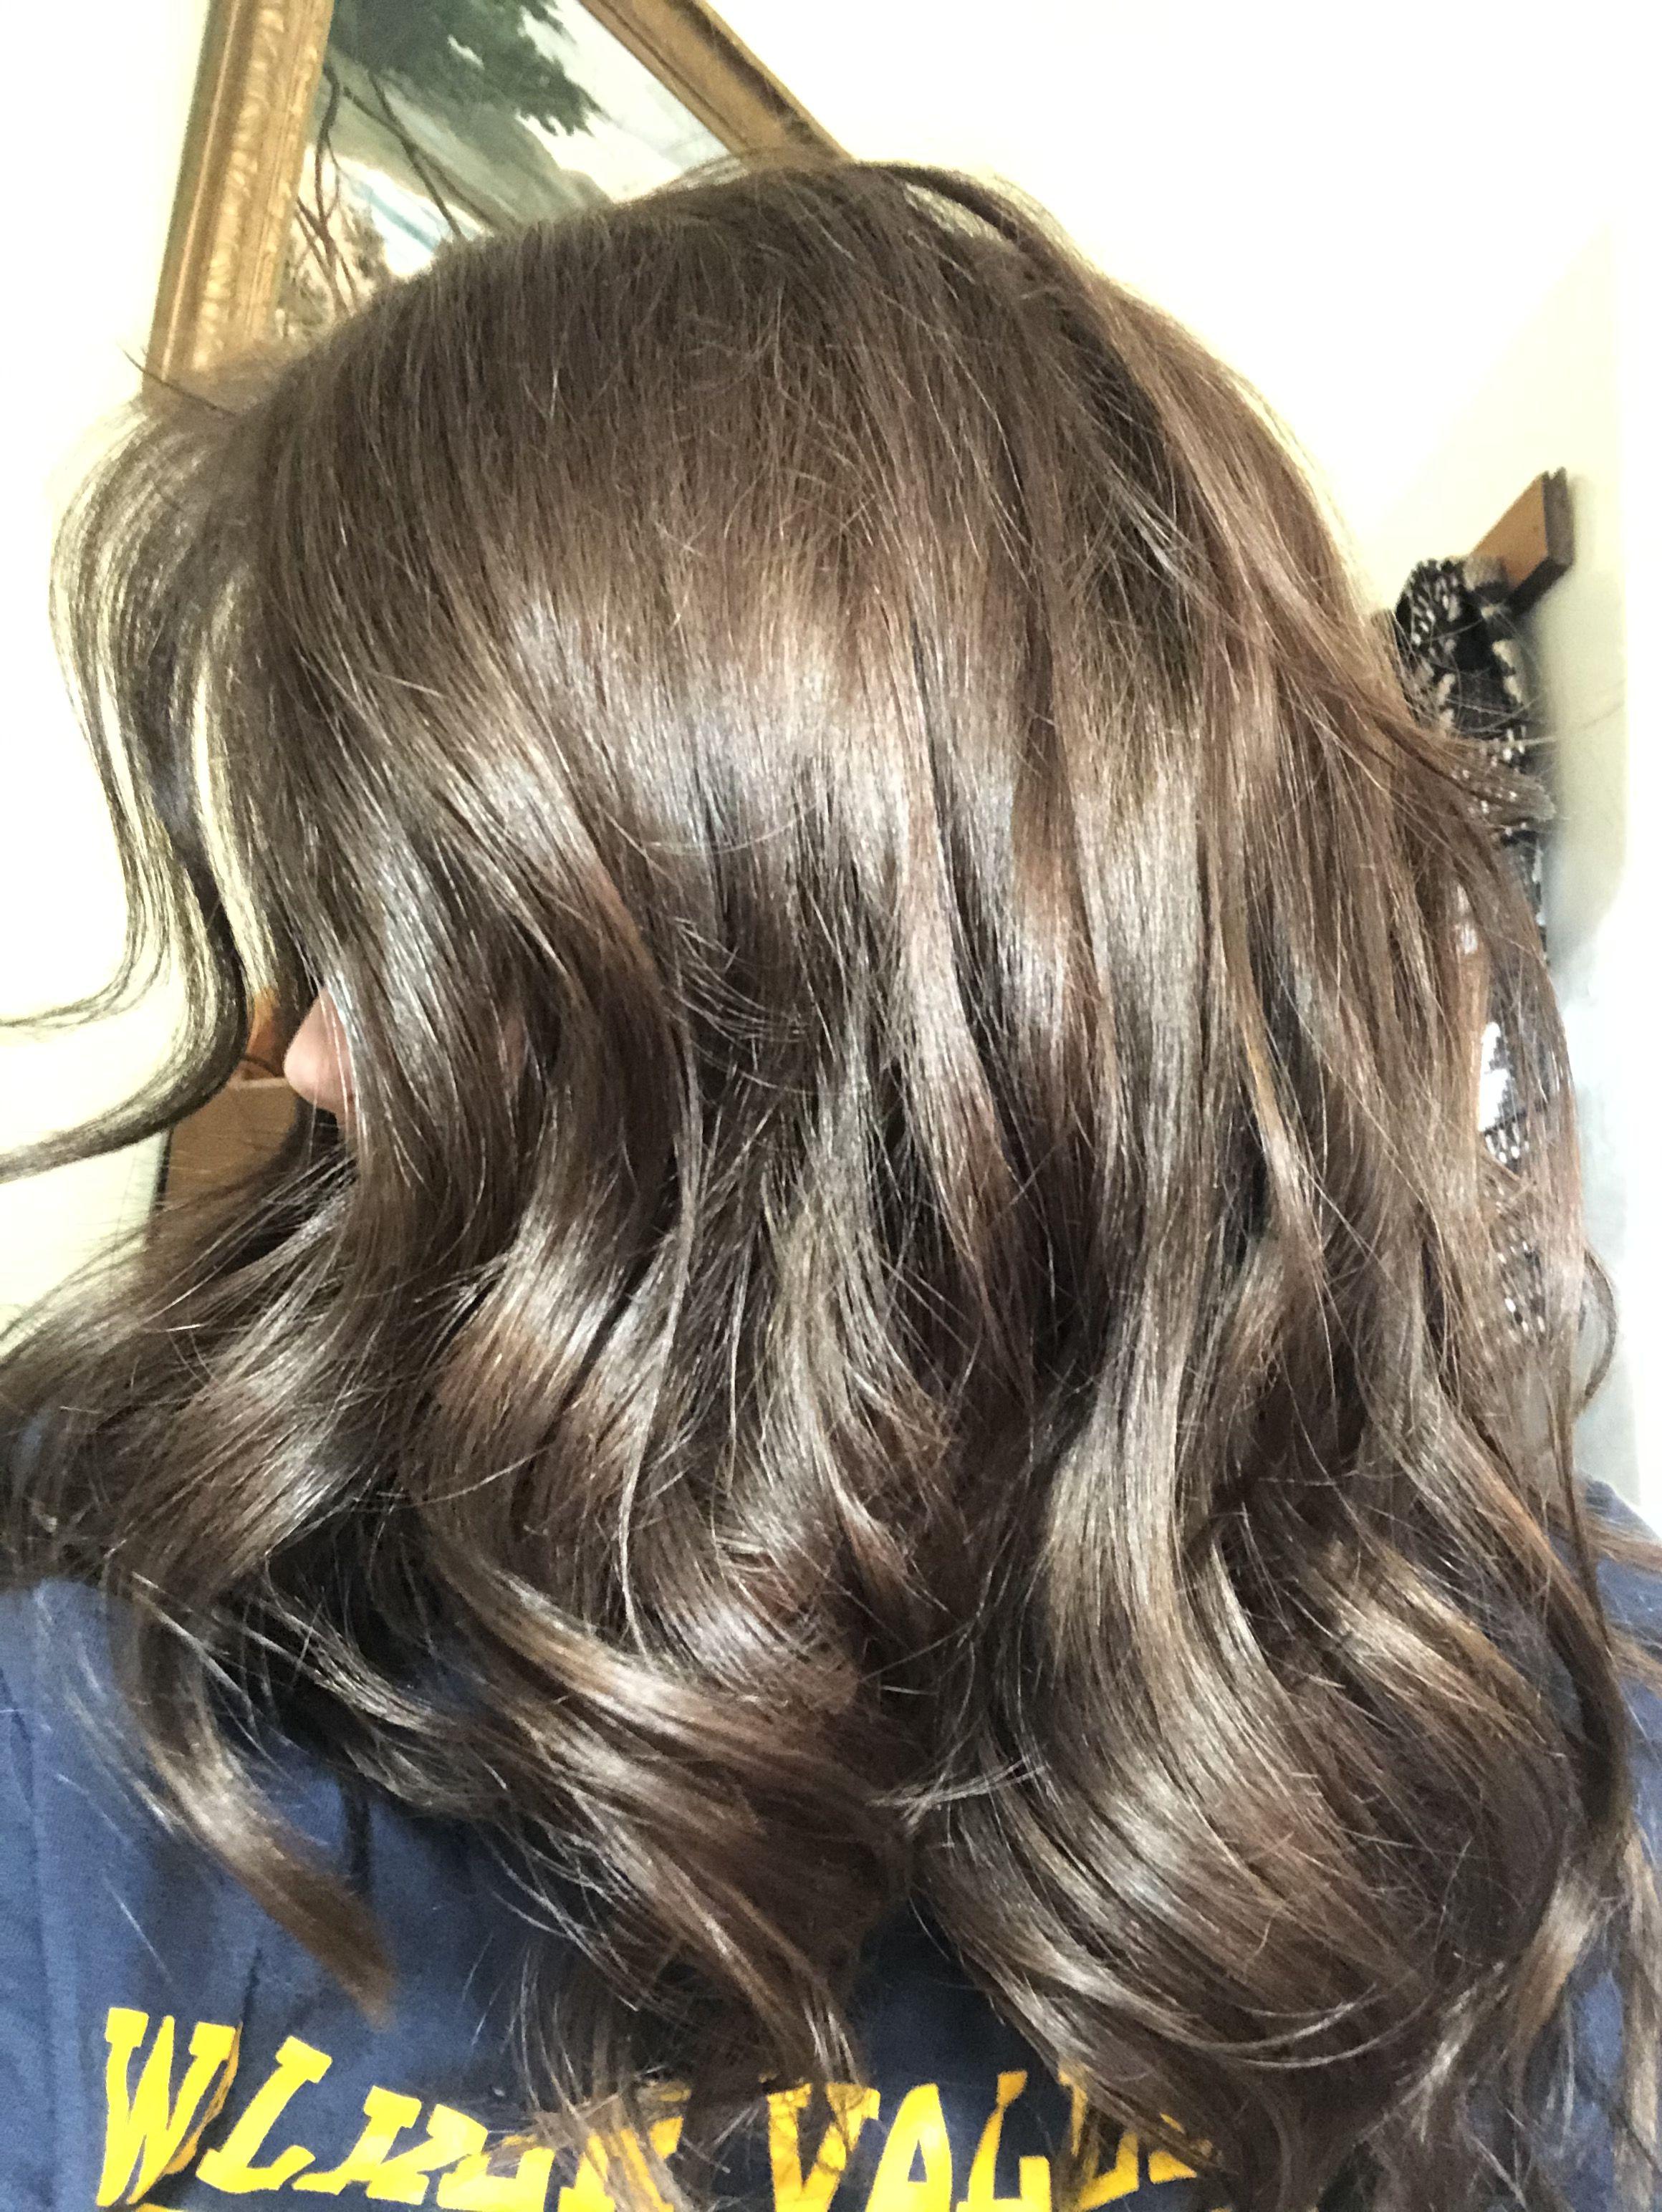 Ion Color Brilliance Permanent Hair Color In Level 6 Dark Mushroom Blonde Blonde Hair Color Balayage Hair Color Techniques Level 6 Hair Color